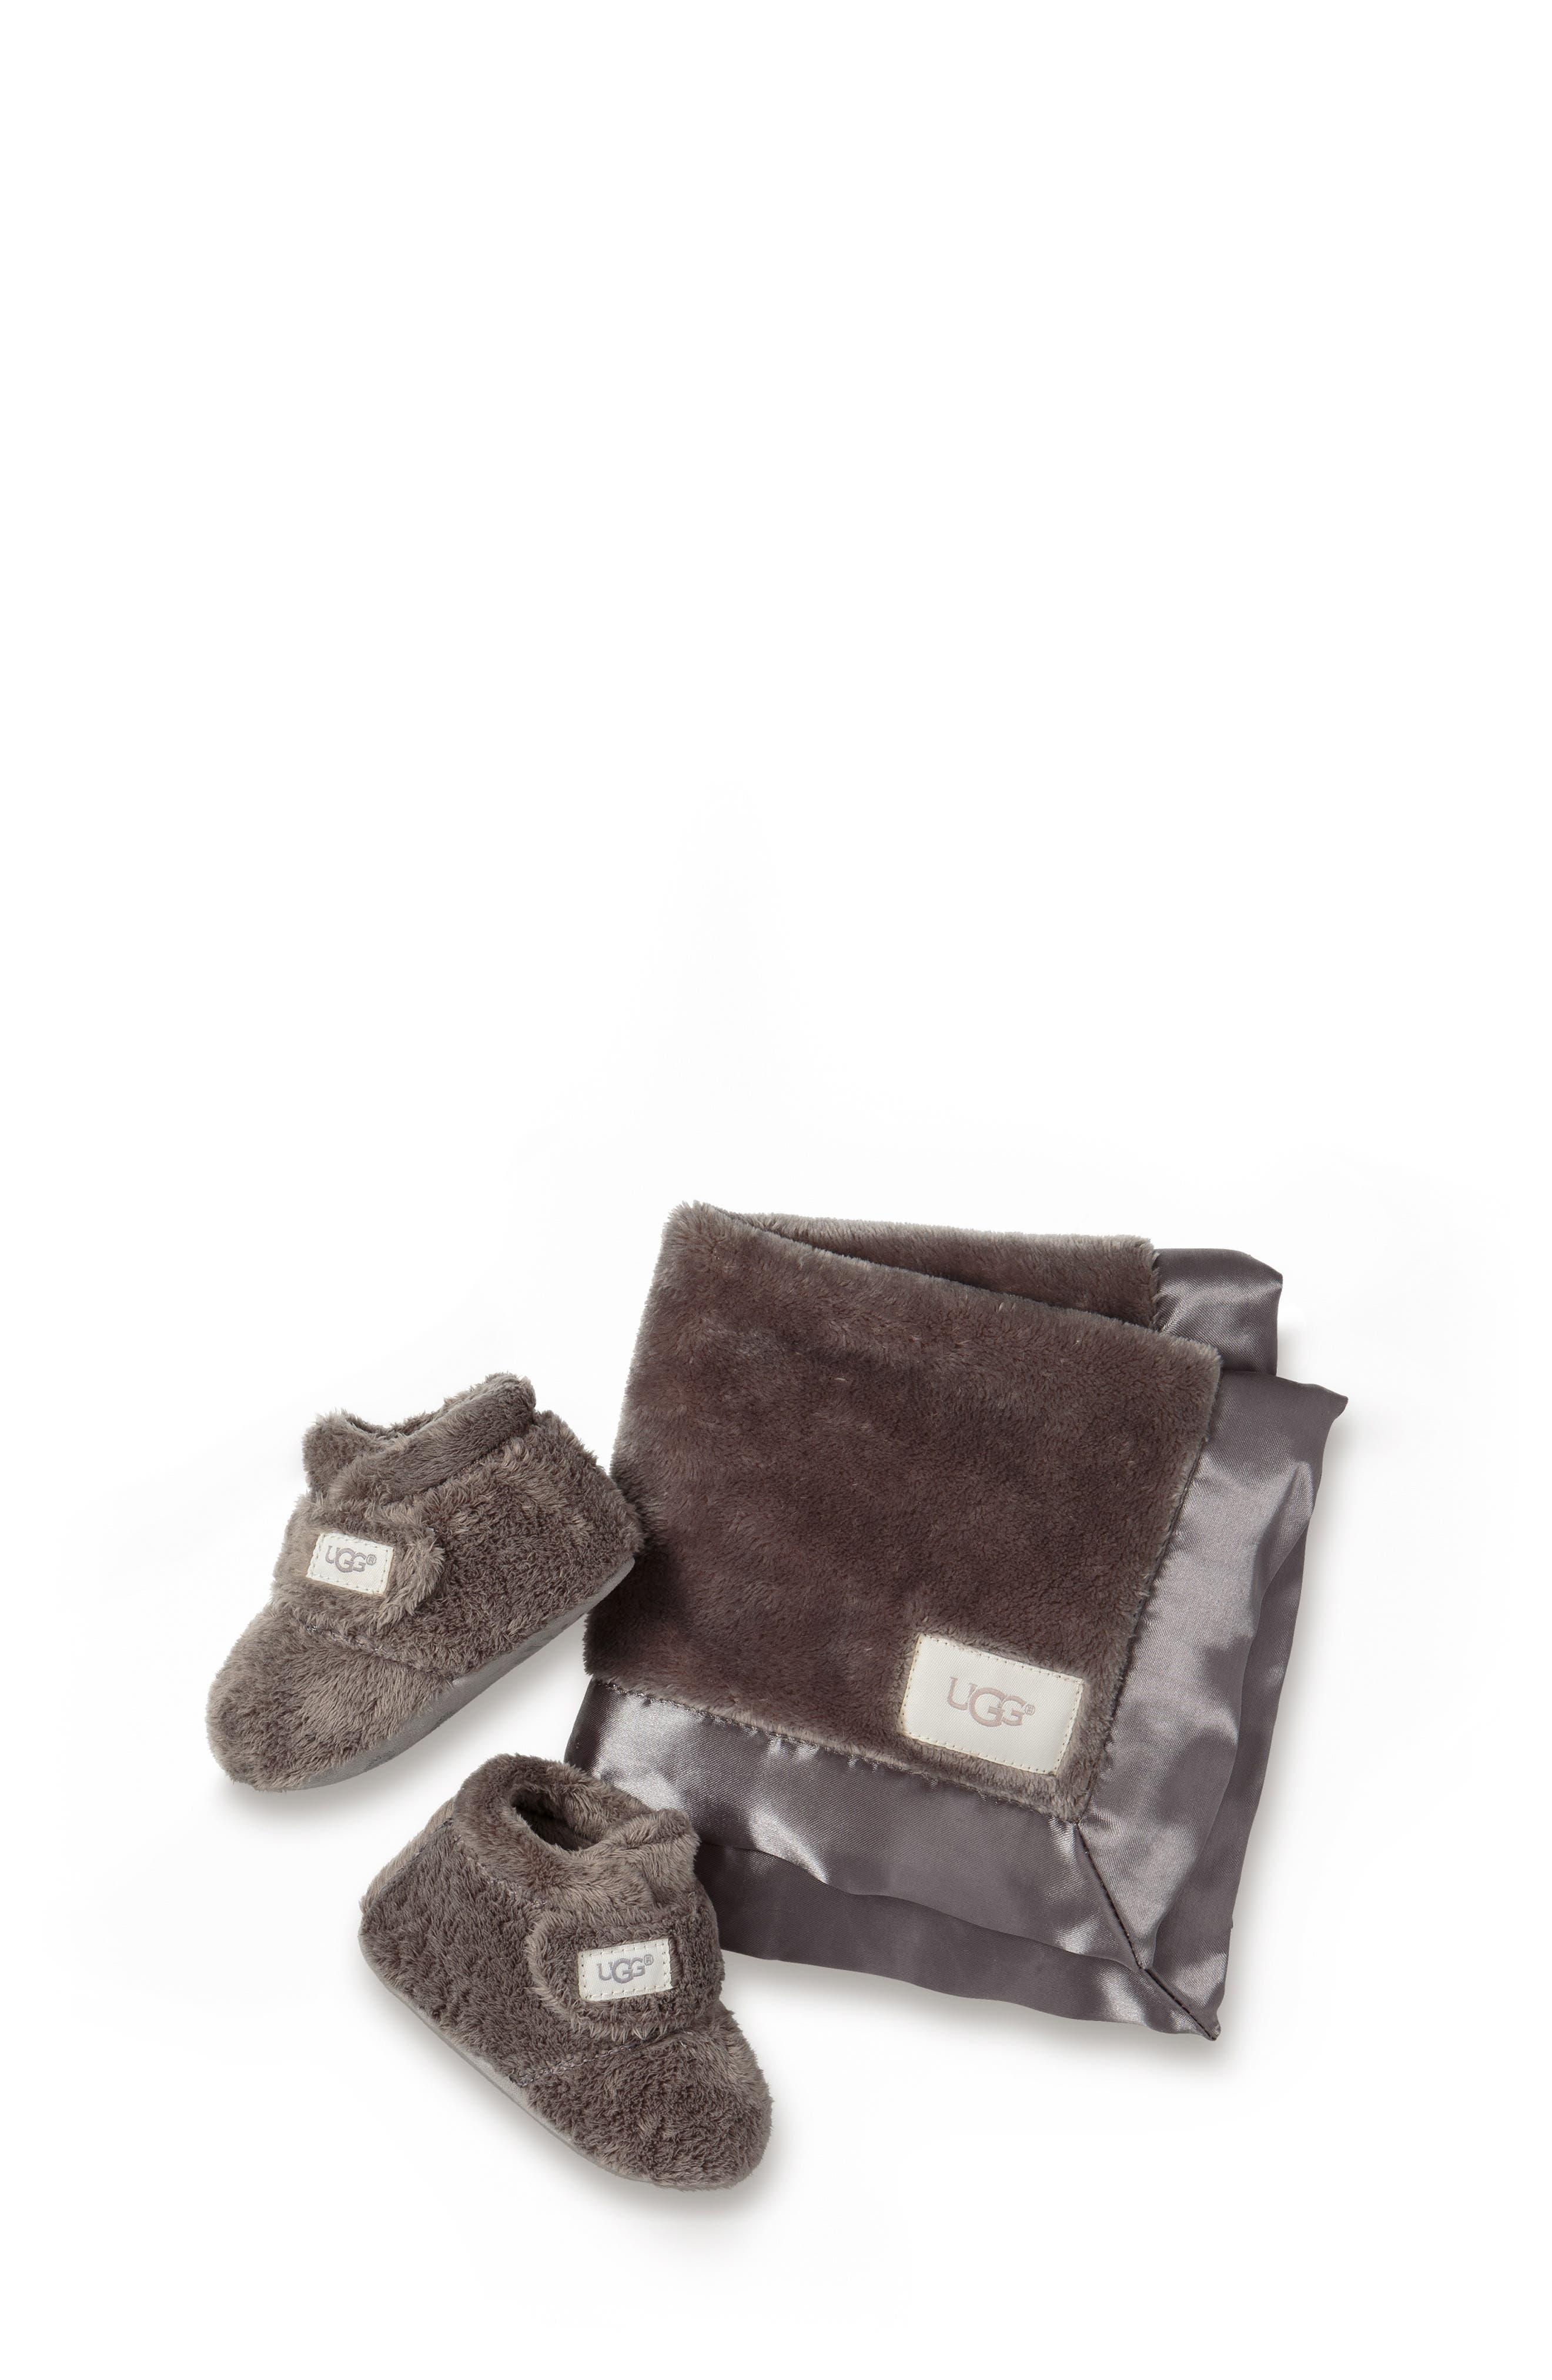 UGG<SUP>®</SUP>, Bixbee Booties & Lovey Blanket Set, Main thumbnail 1, color, CHARCOAL